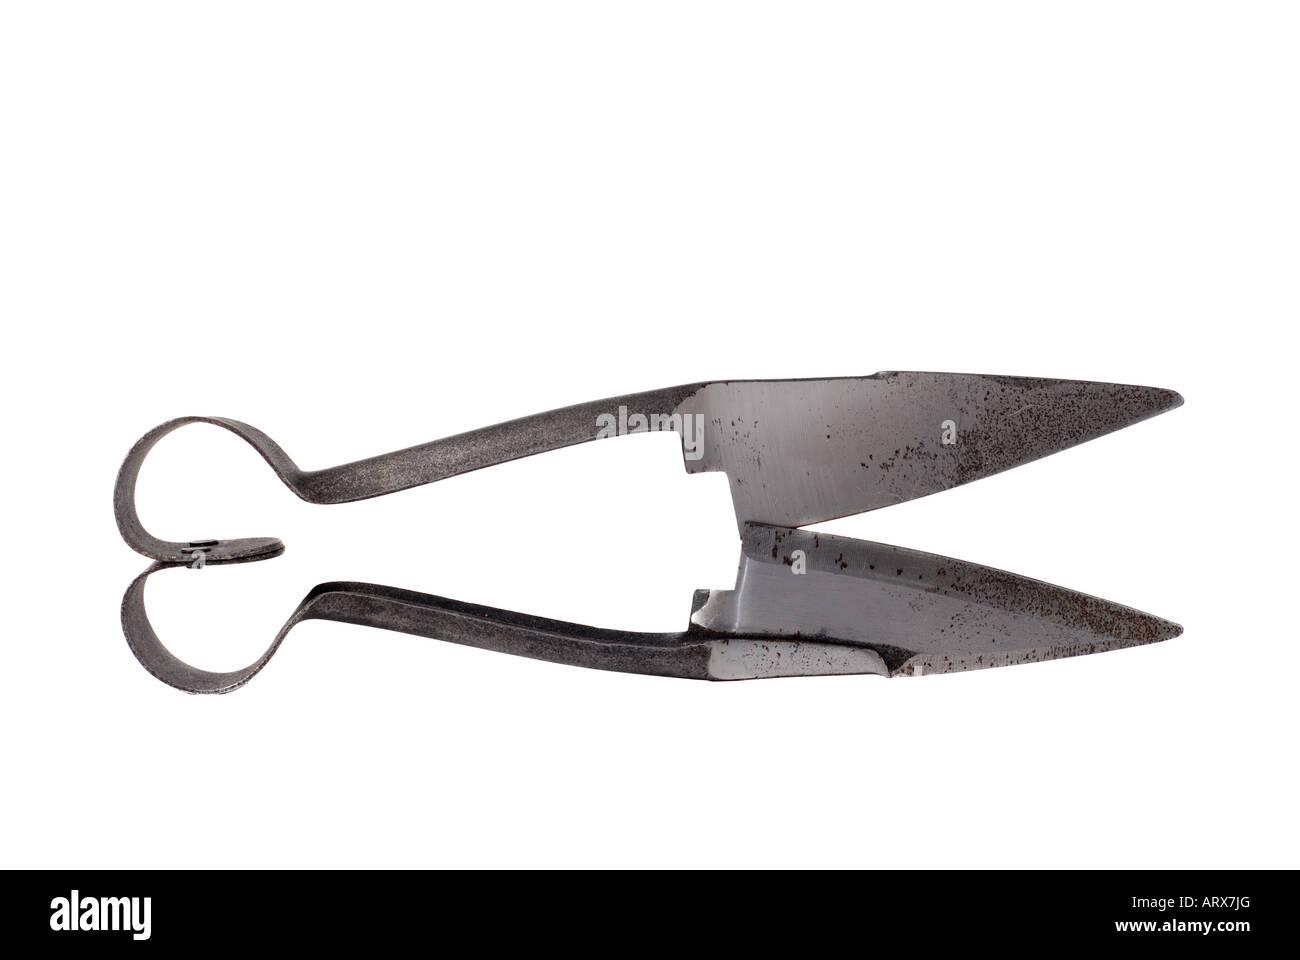 Hand shears - Stock Image